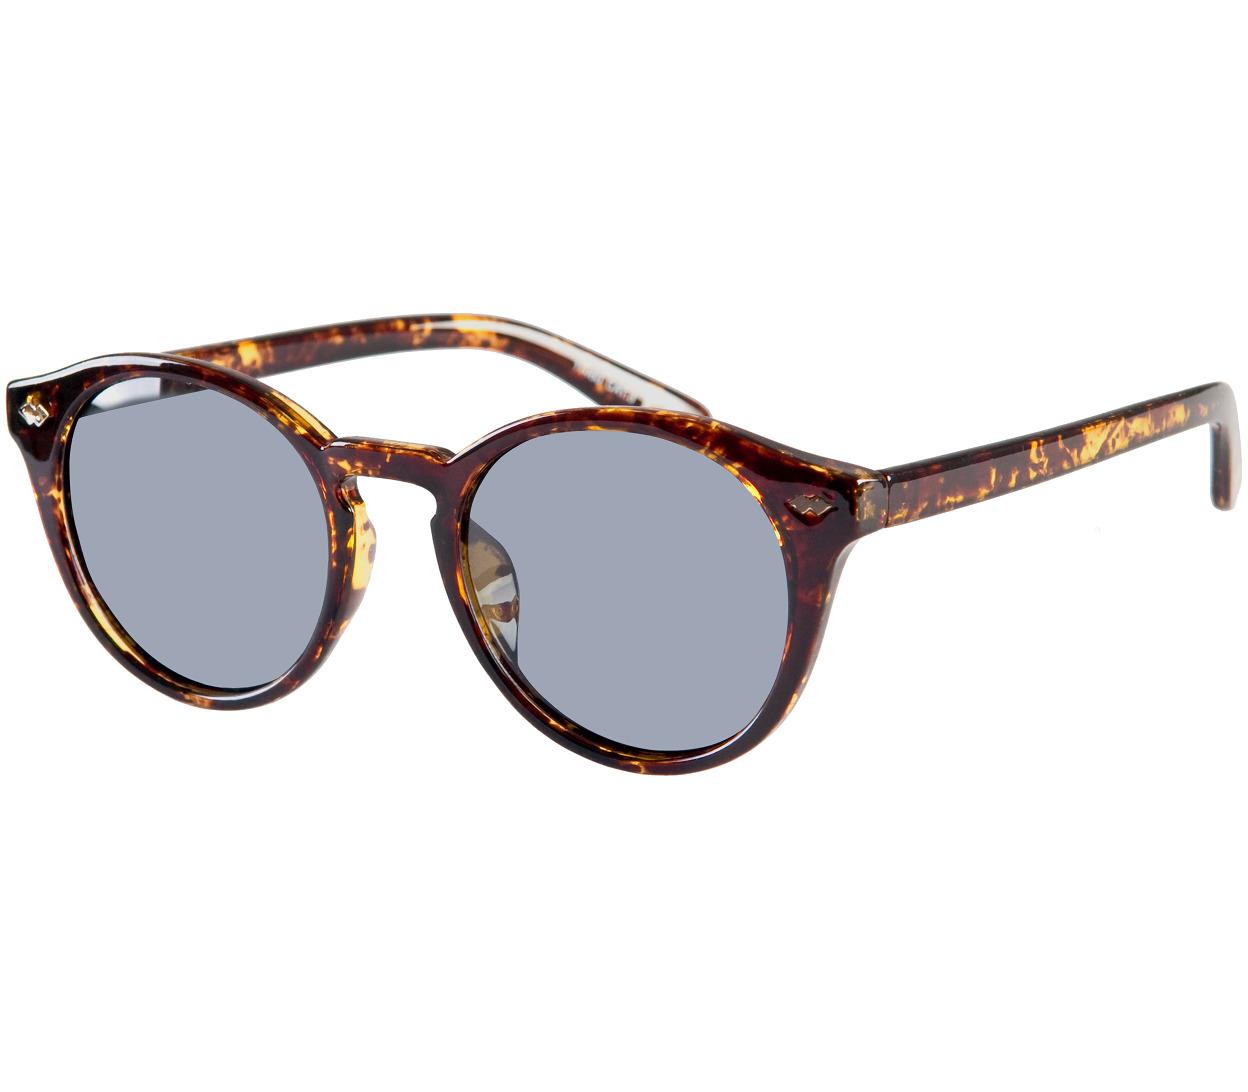 Main Image (Angle) - Lorenzo (Tortoiseshell) Retro Sunglasses